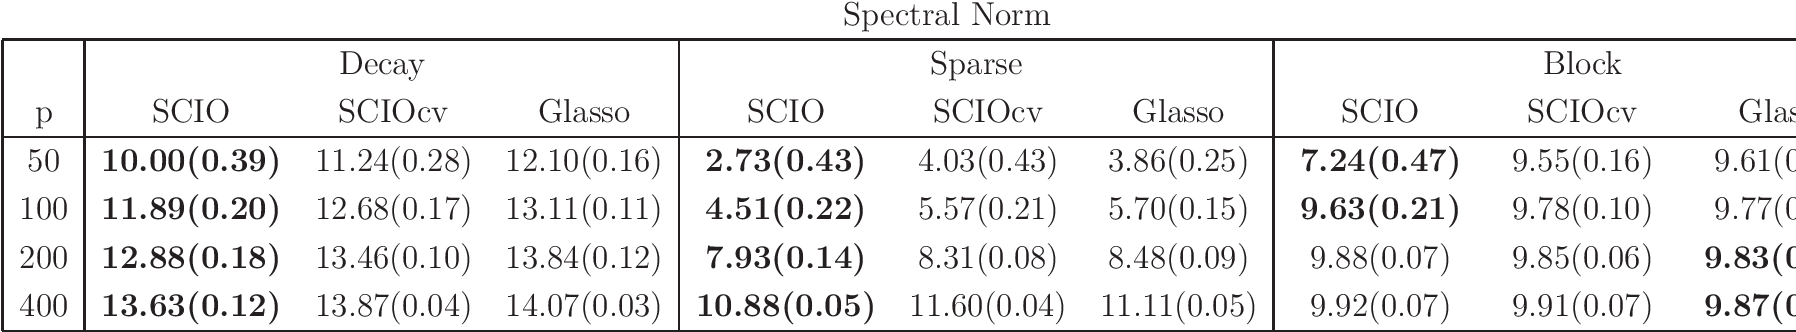 Figure 1 for Fast and Adaptive Sparse Precision Matrix Estimation in High Dimensions